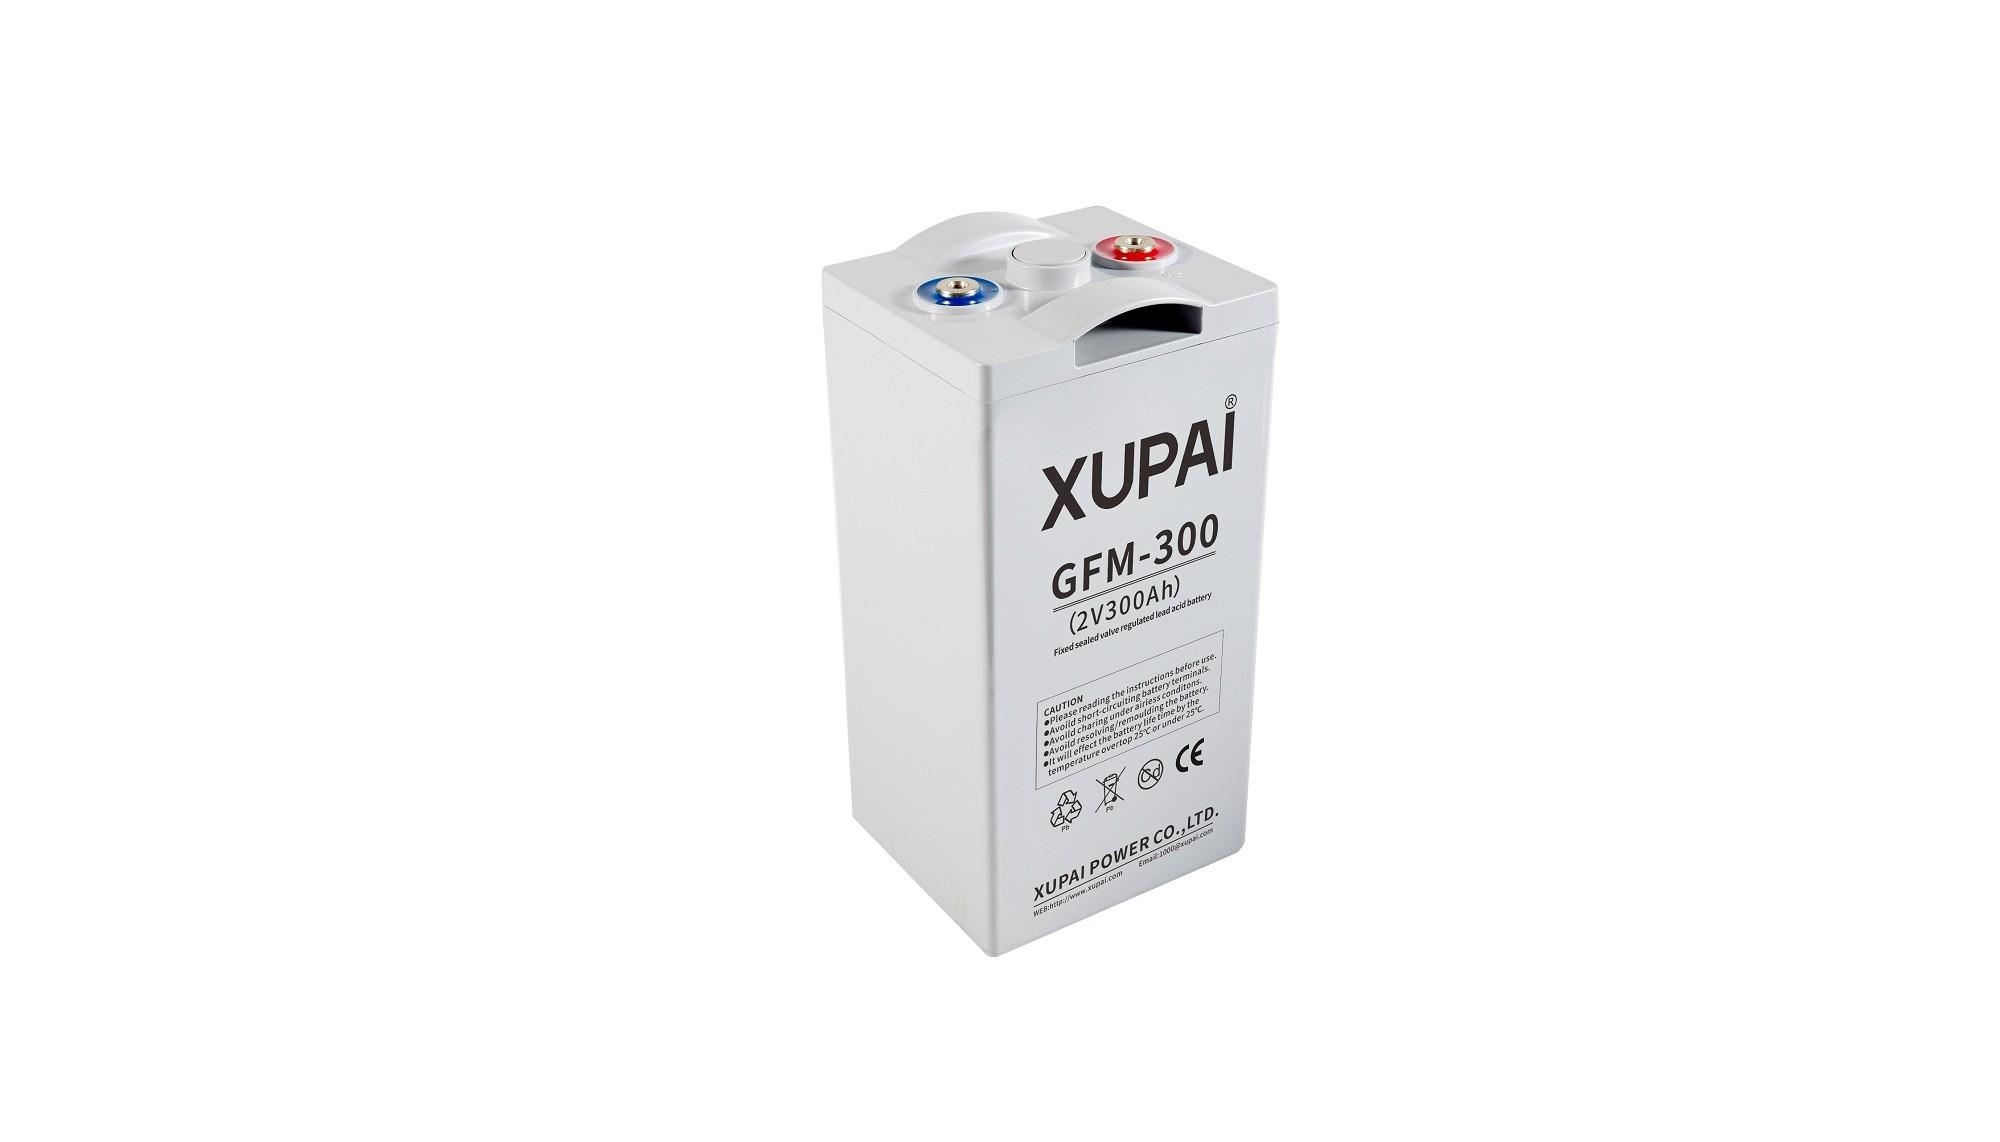 XUPAI GFM-300 long life backup base station battery